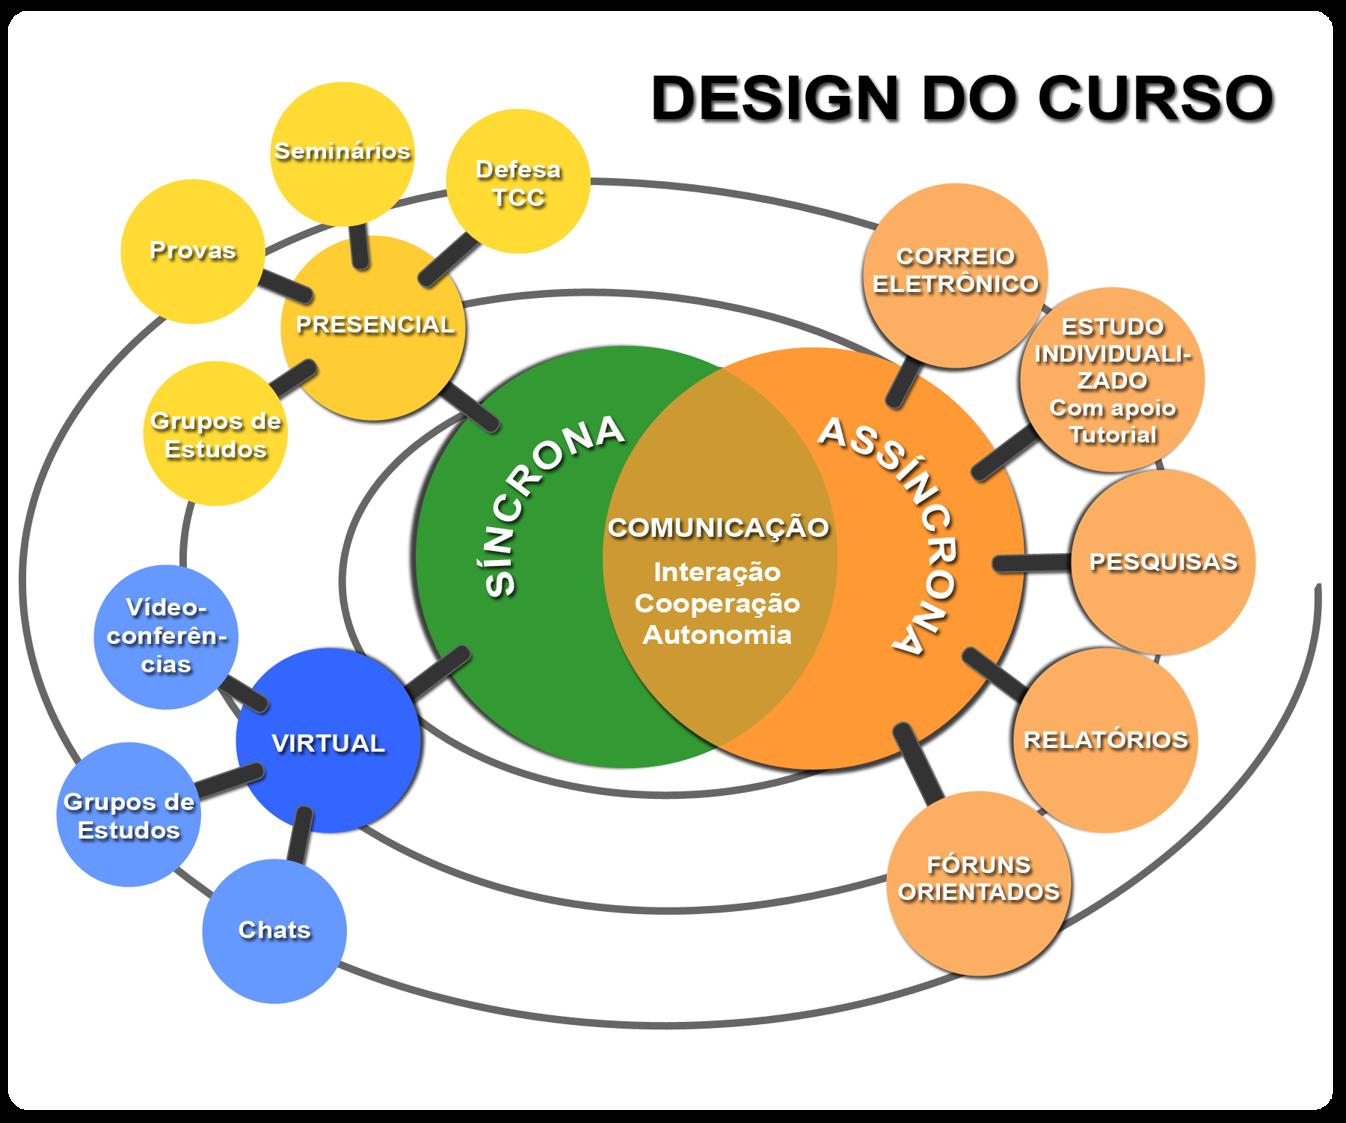 #CAA201 Metodologia Portal NUTEAD 1346x1123 píxeis em Curso Design Ead